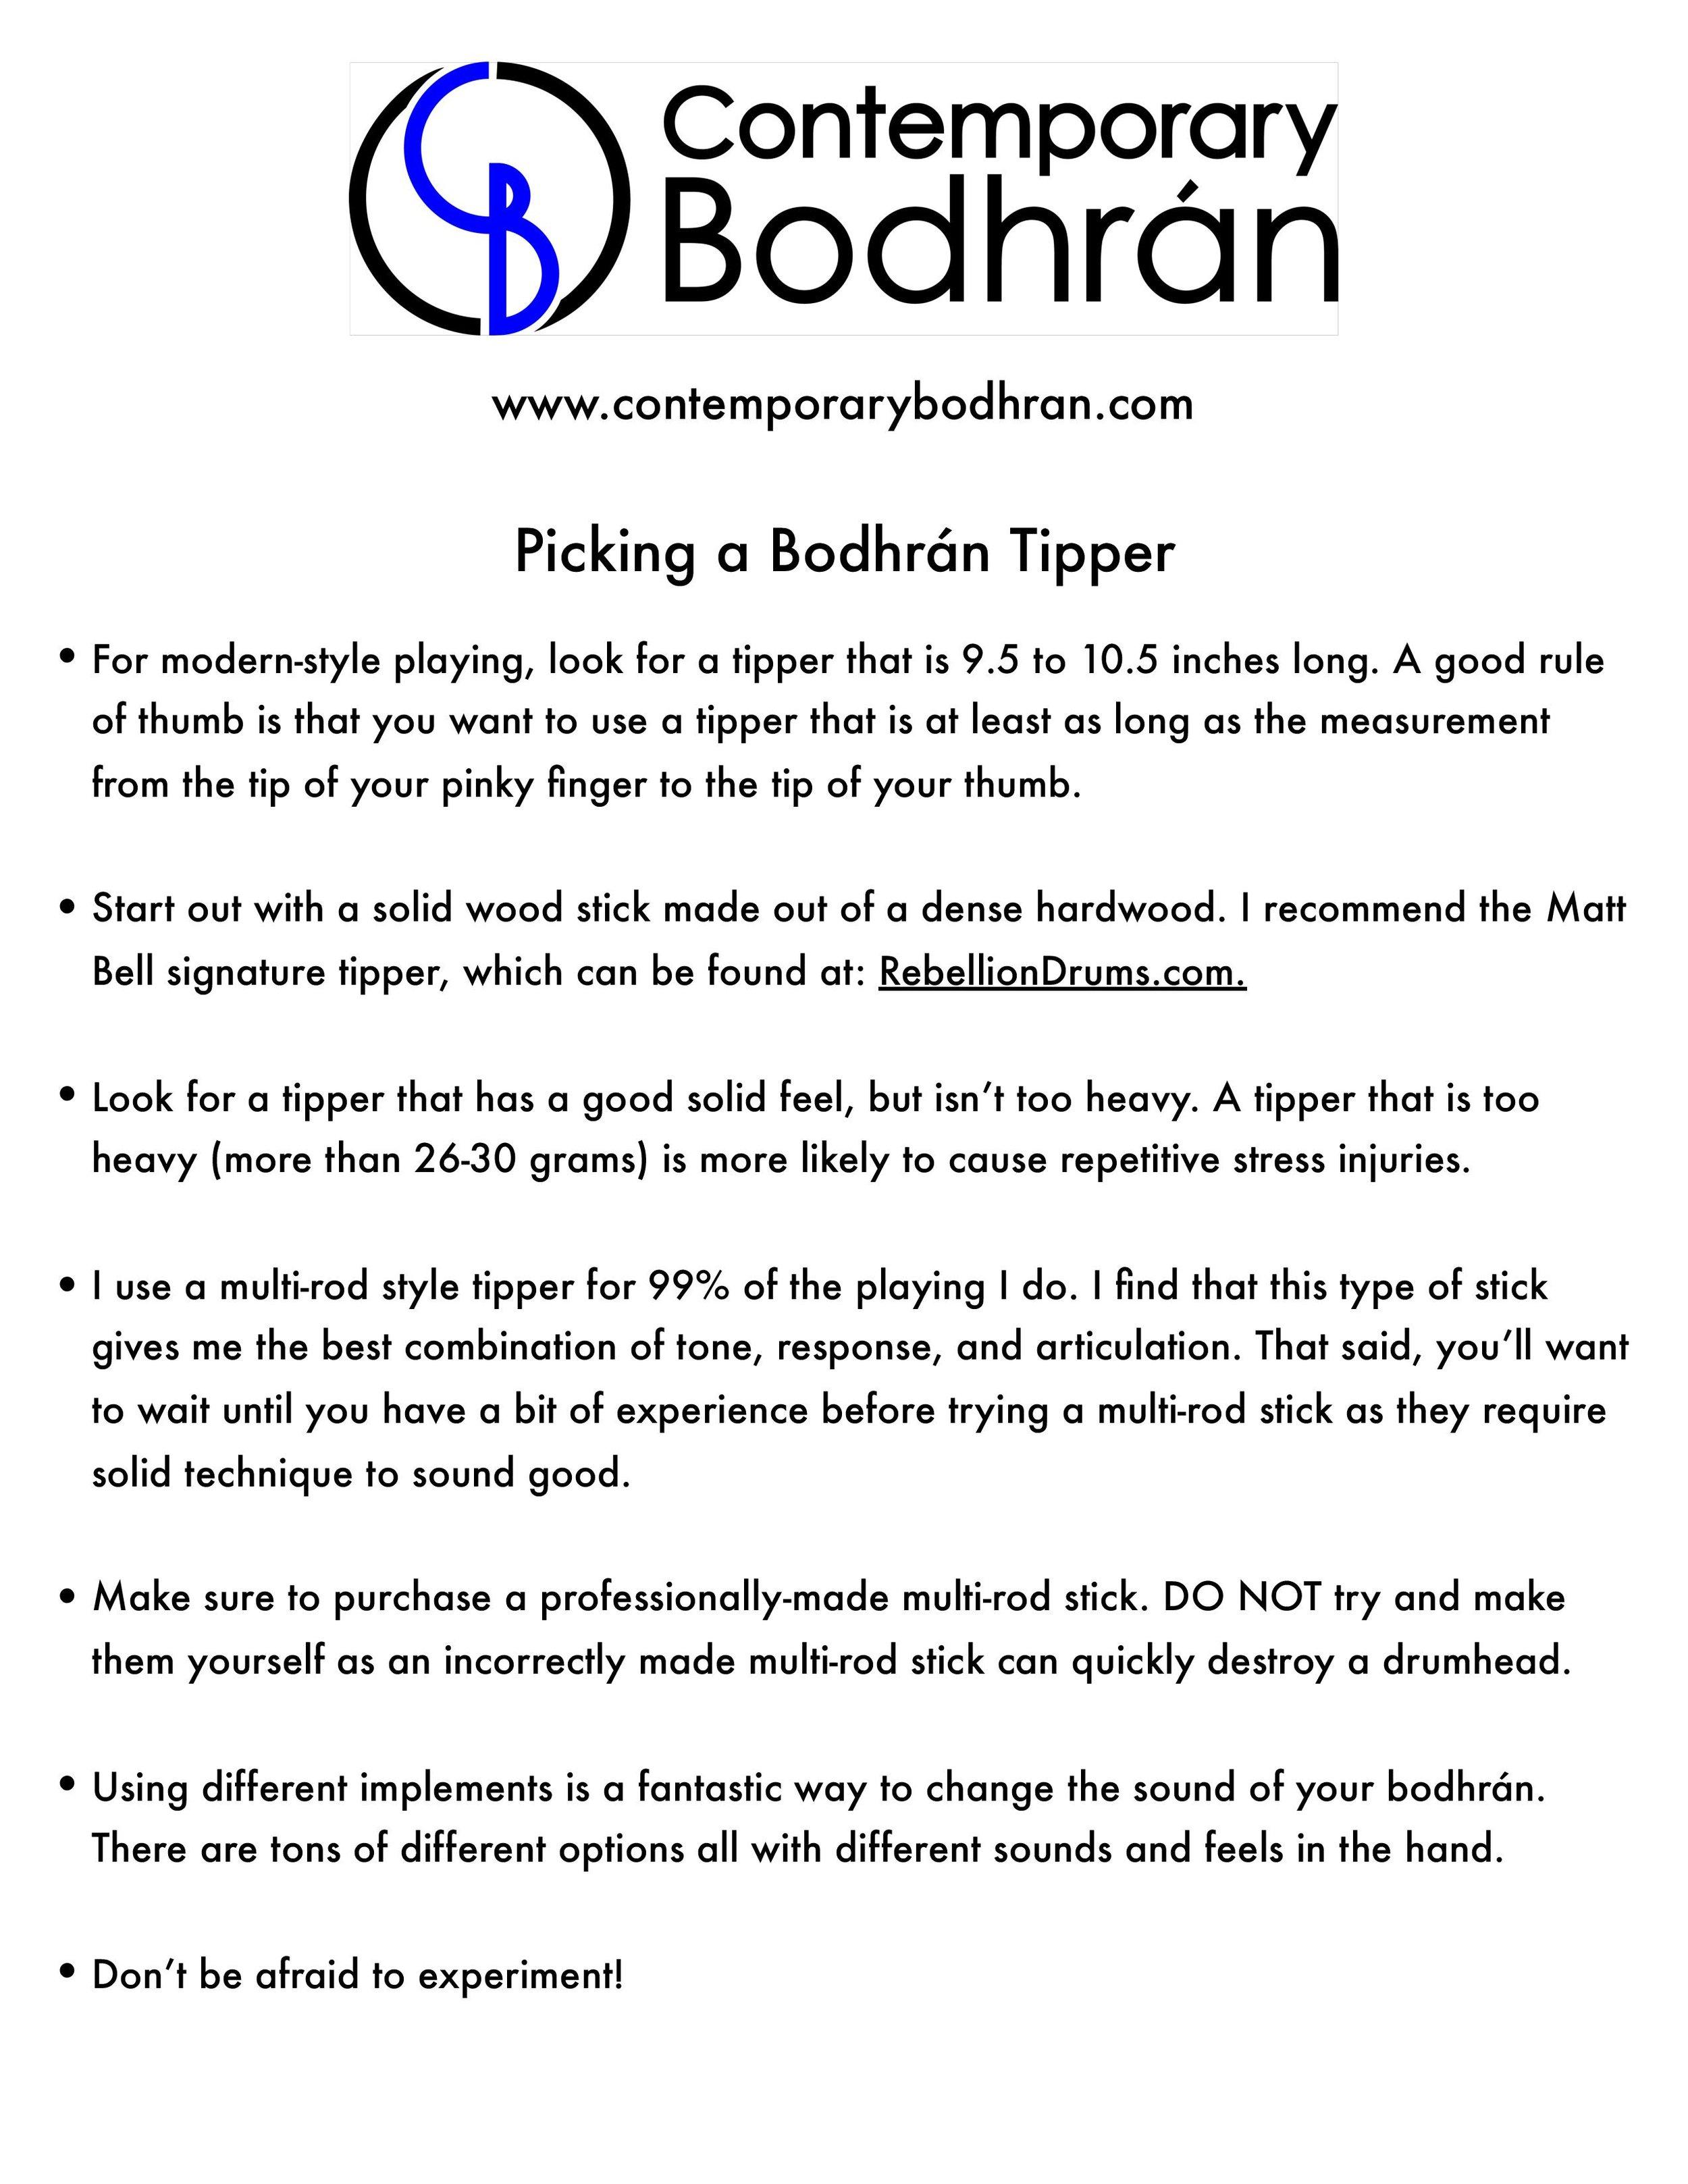 Picking a Bodhrán Tipper-page-001.jpg